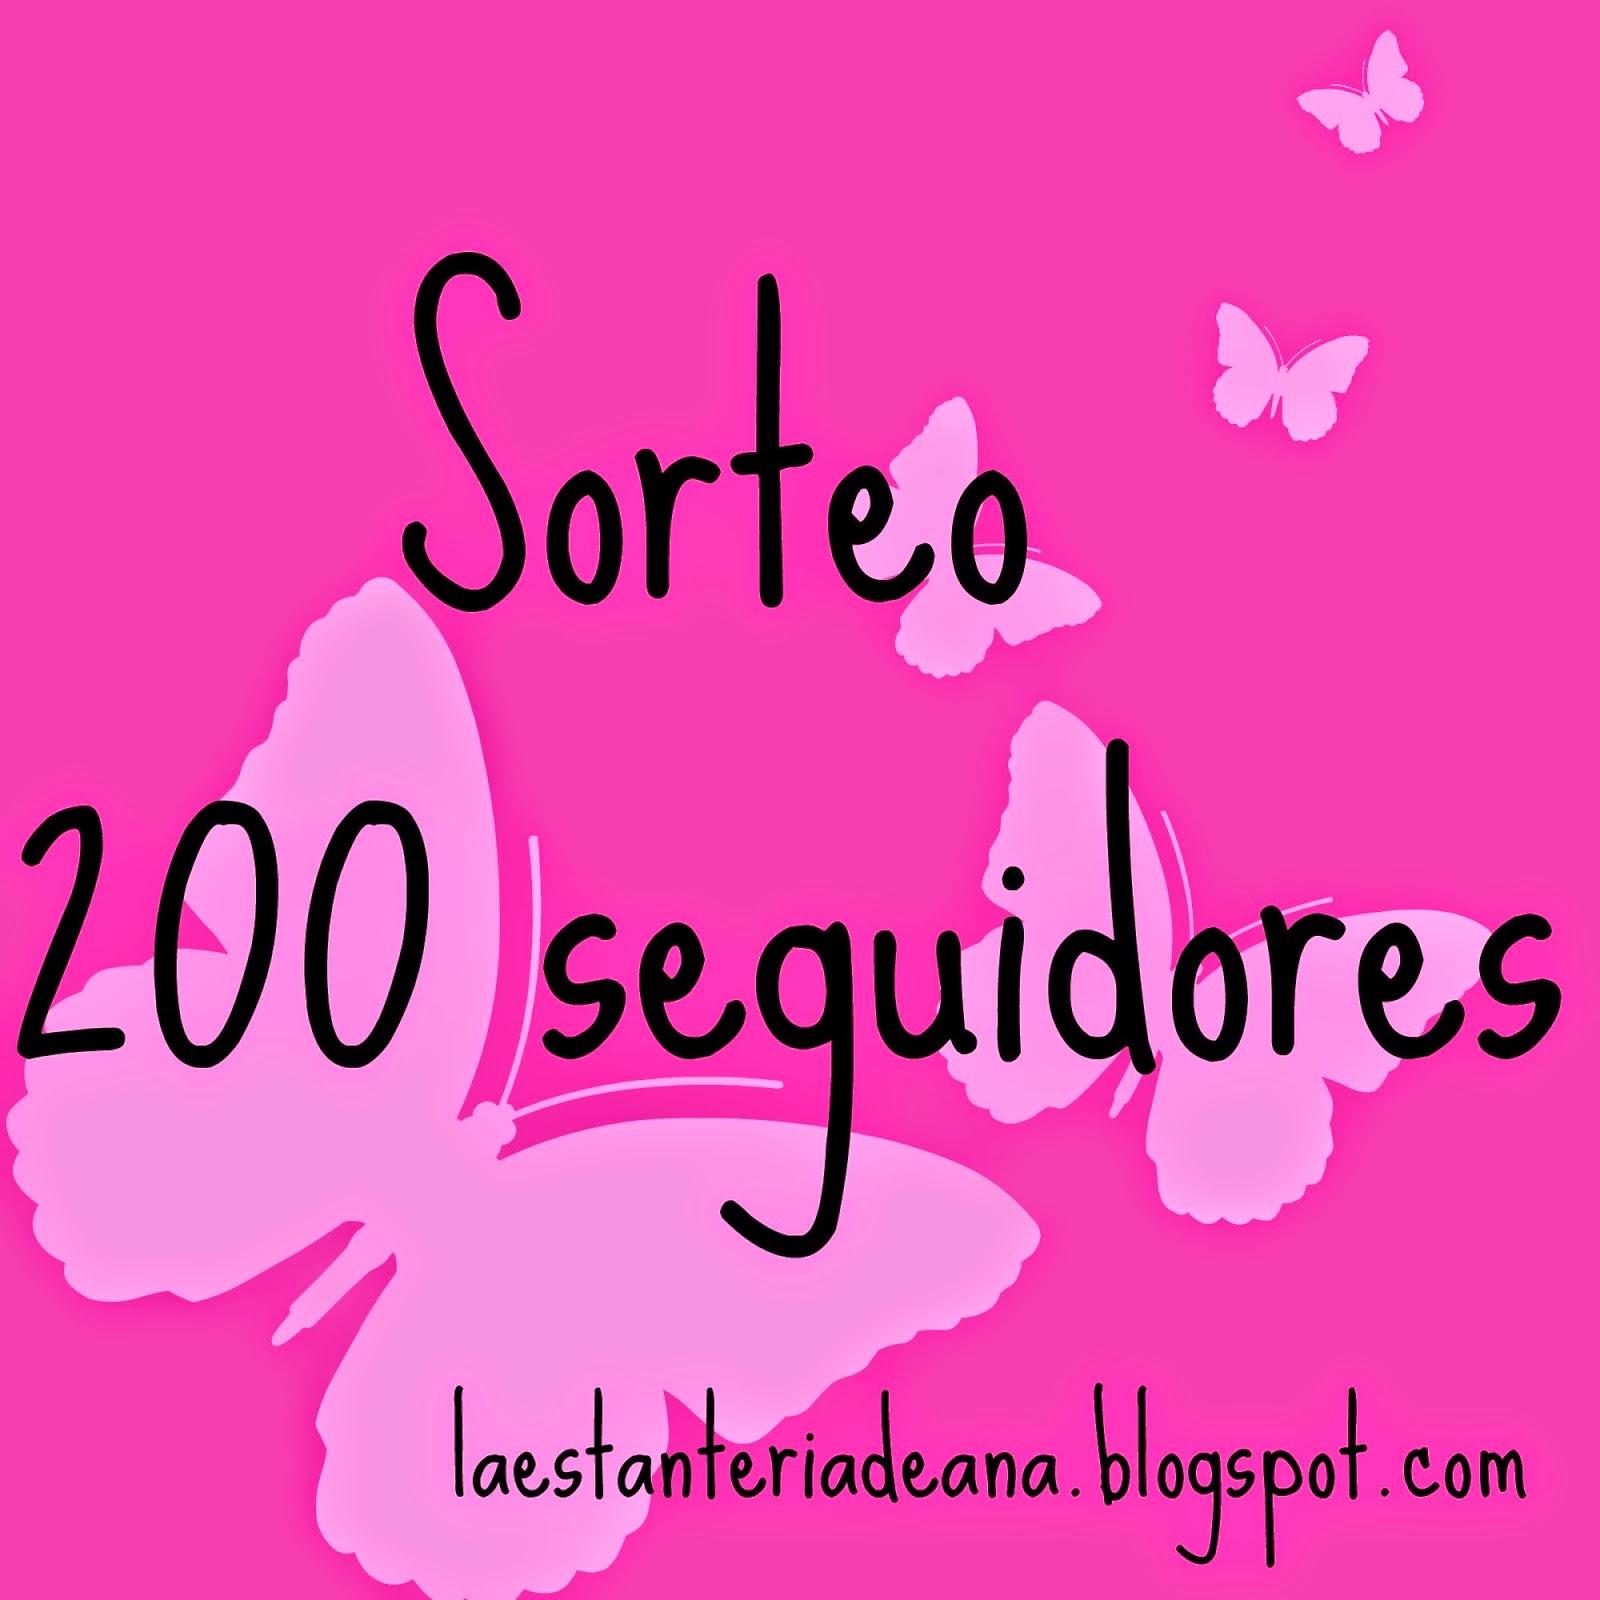 http://laestanteriadeana.blogspot.com.es/2014/10/sorteo-200-seguidores.html?showComment=1415654081846#c6337815936899077024